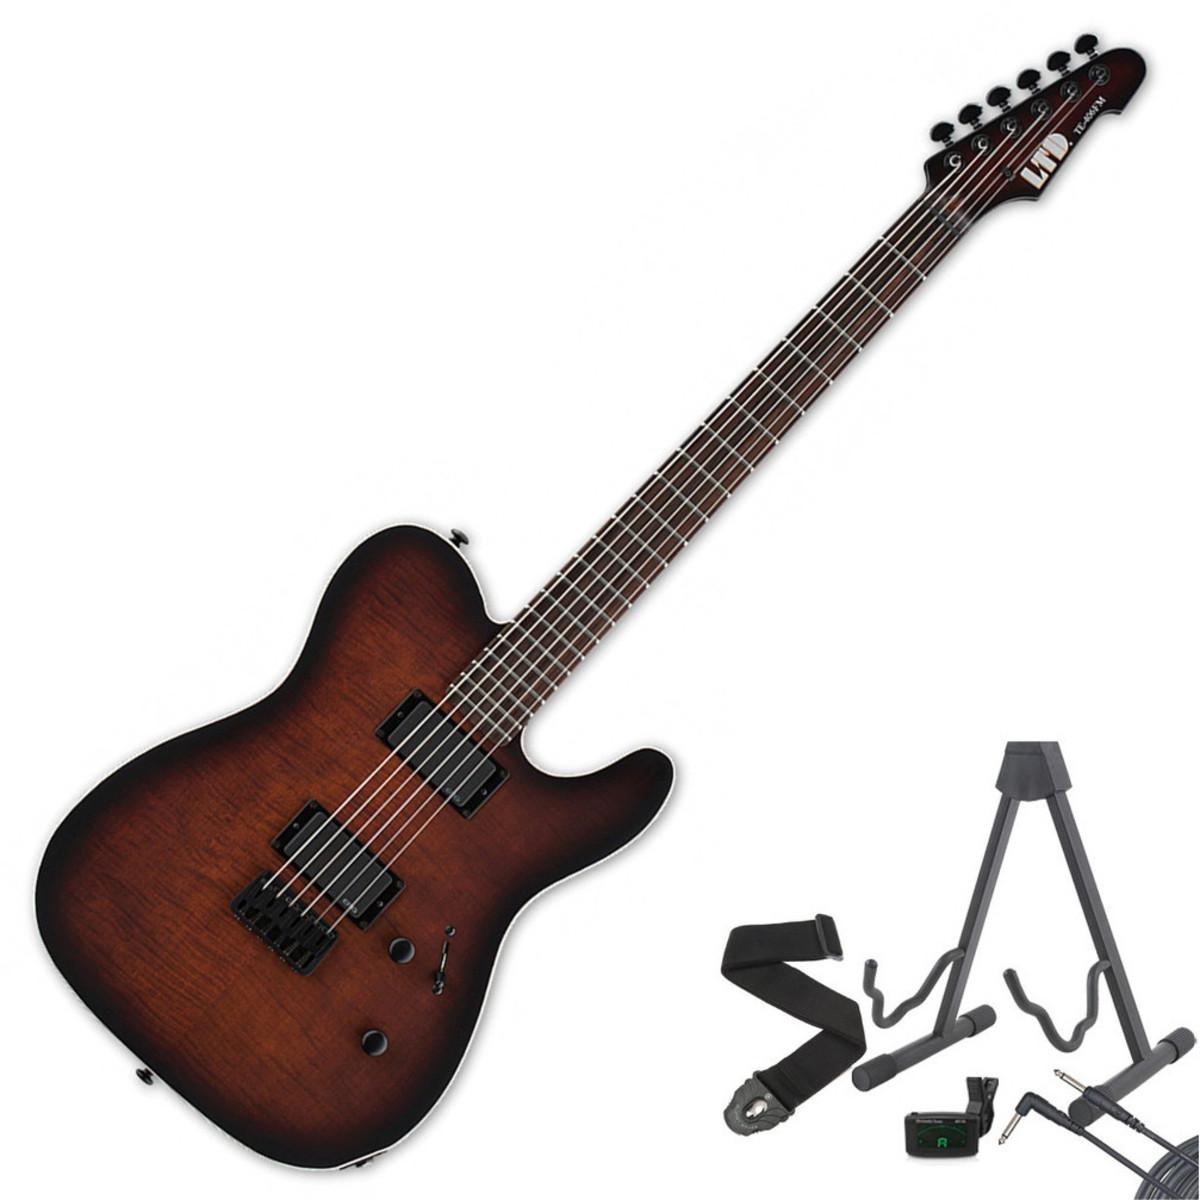 disc esp ltd te 406fm guitar dark brown sunburst satin free gifts at. Black Bedroom Furniture Sets. Home Design Ideas